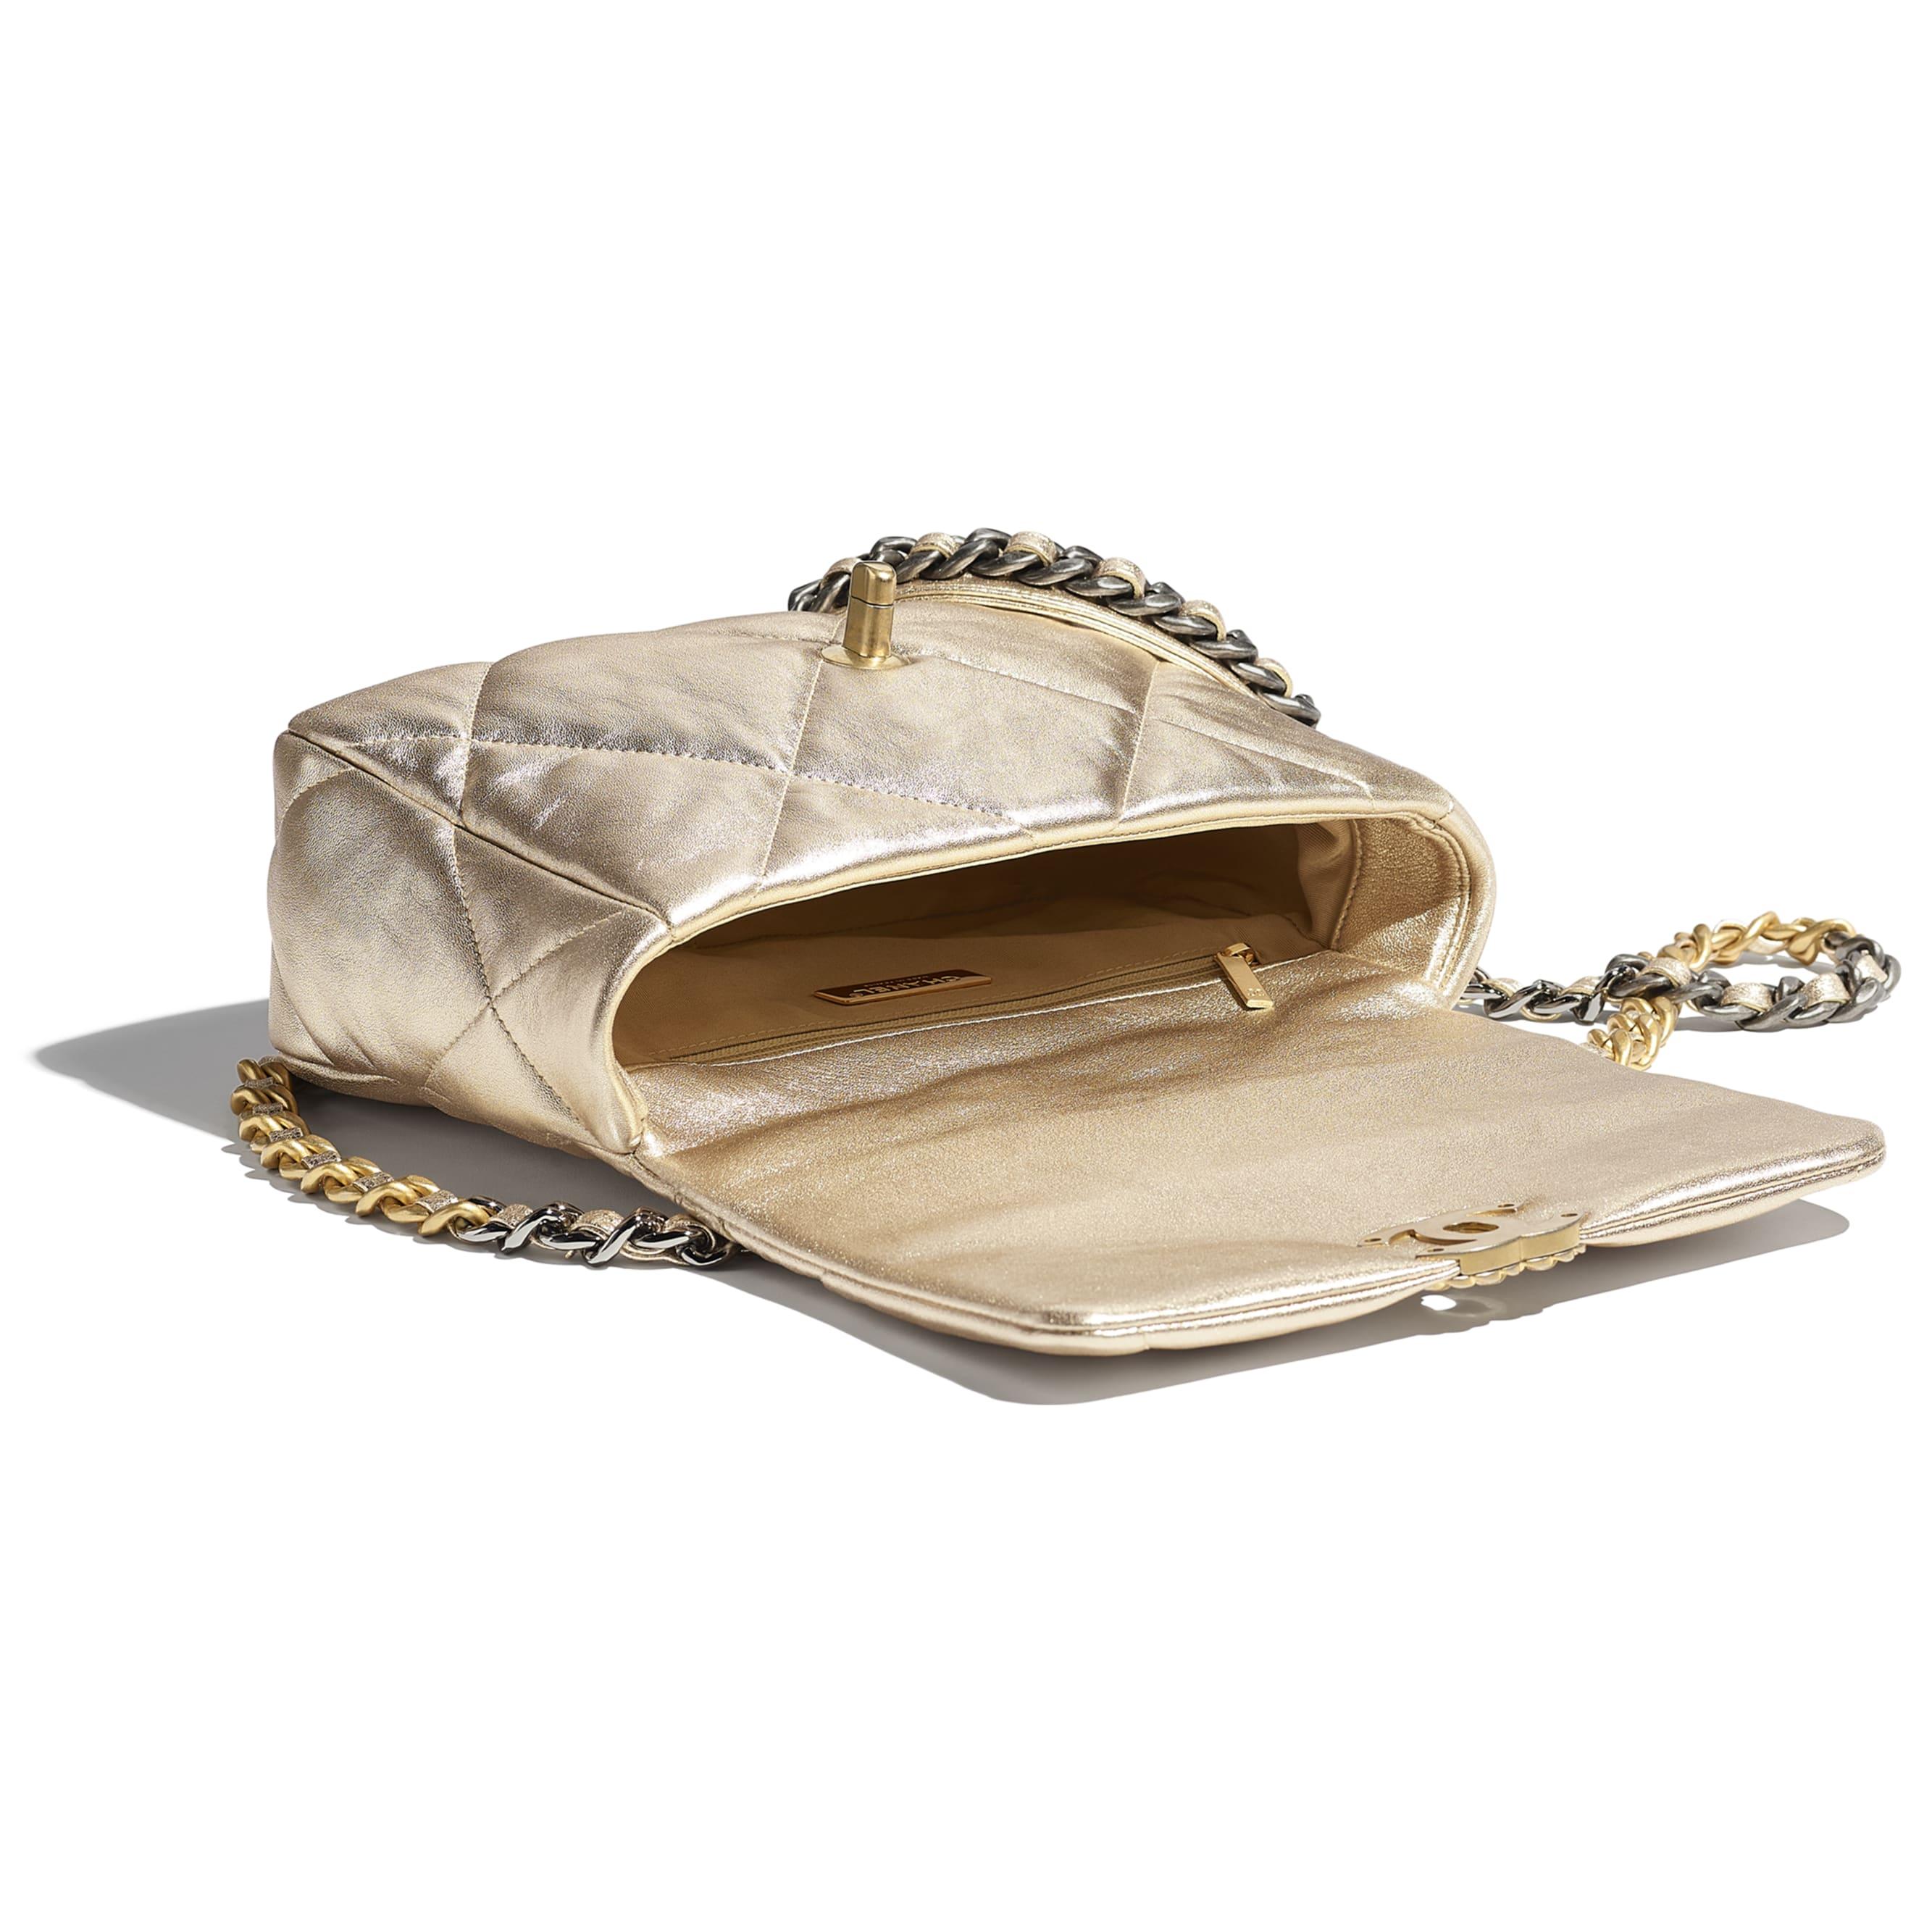 CHANEL 19 Handbag - Gold - Metallic Lambskin, Gold-Tone, Silver-Tone & Ruthenium-Finish Metal - CHANEL - Other view - see standard sized version